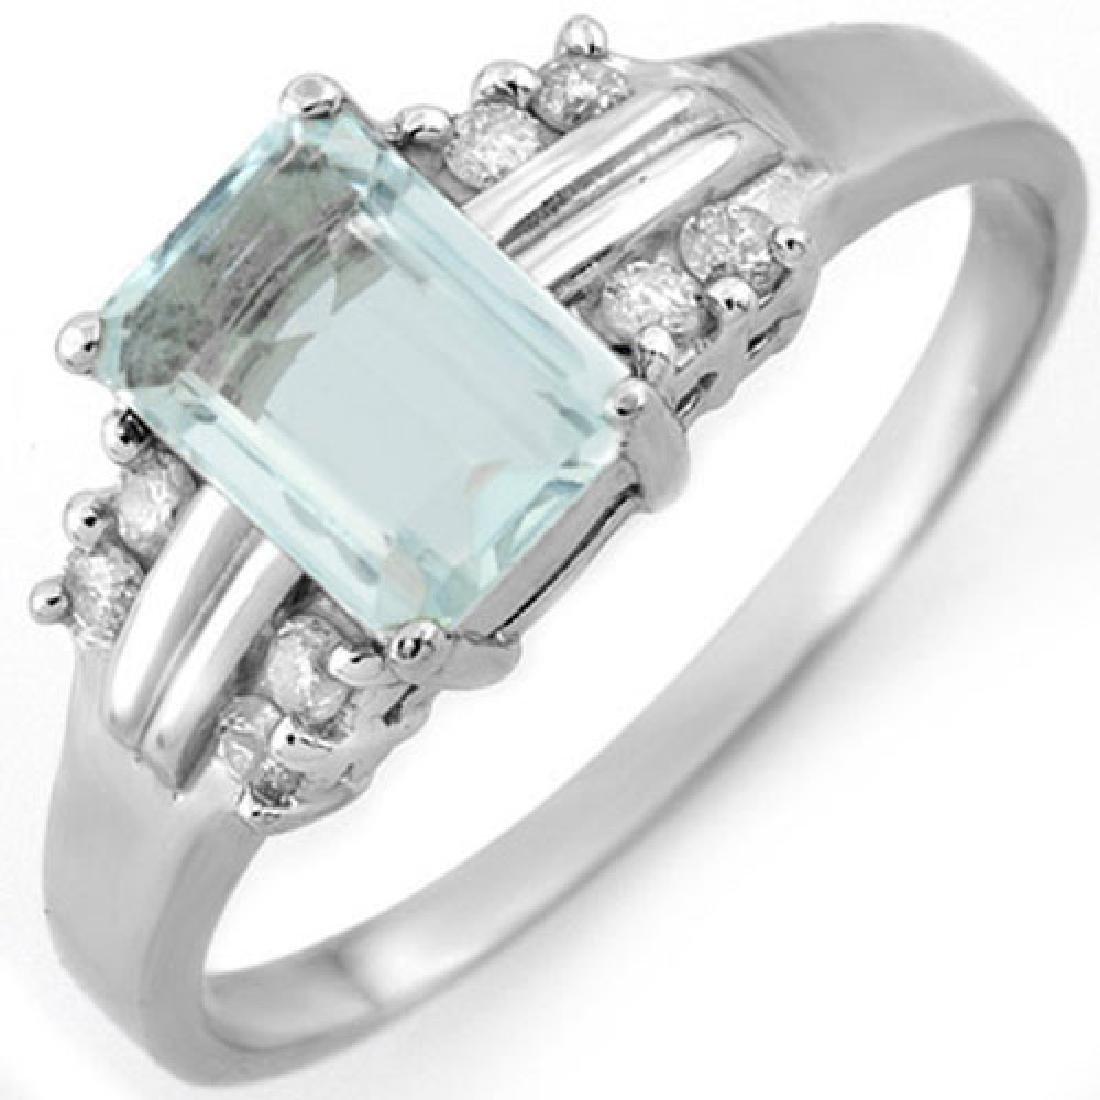 1.41 CTW Aquamarine & Diamond Ring 18K White Gold